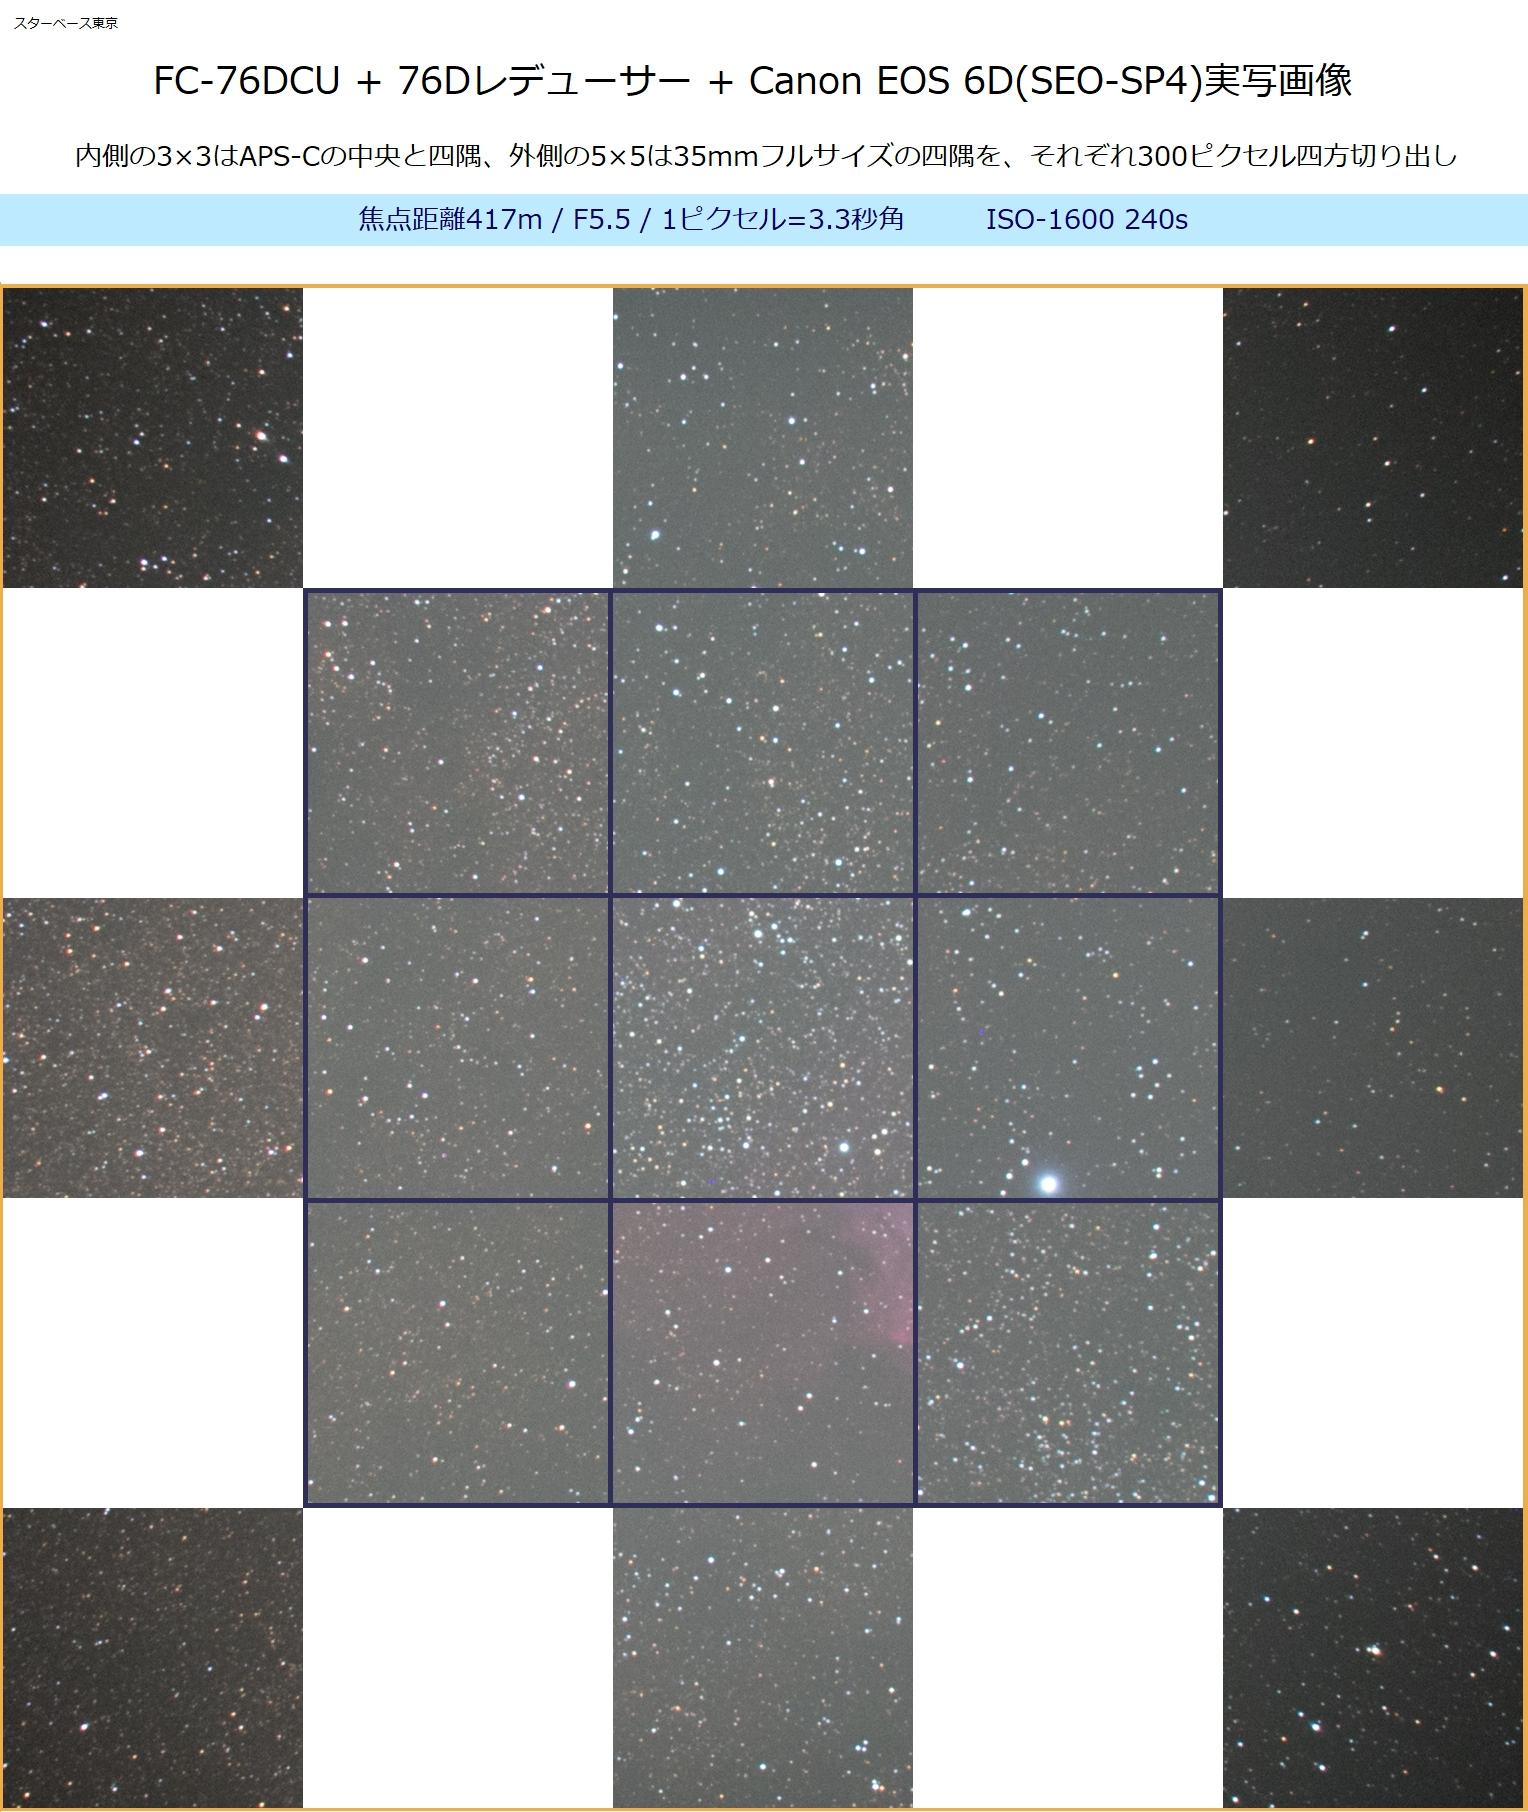 f:id:starbase:20181117190853j:plain